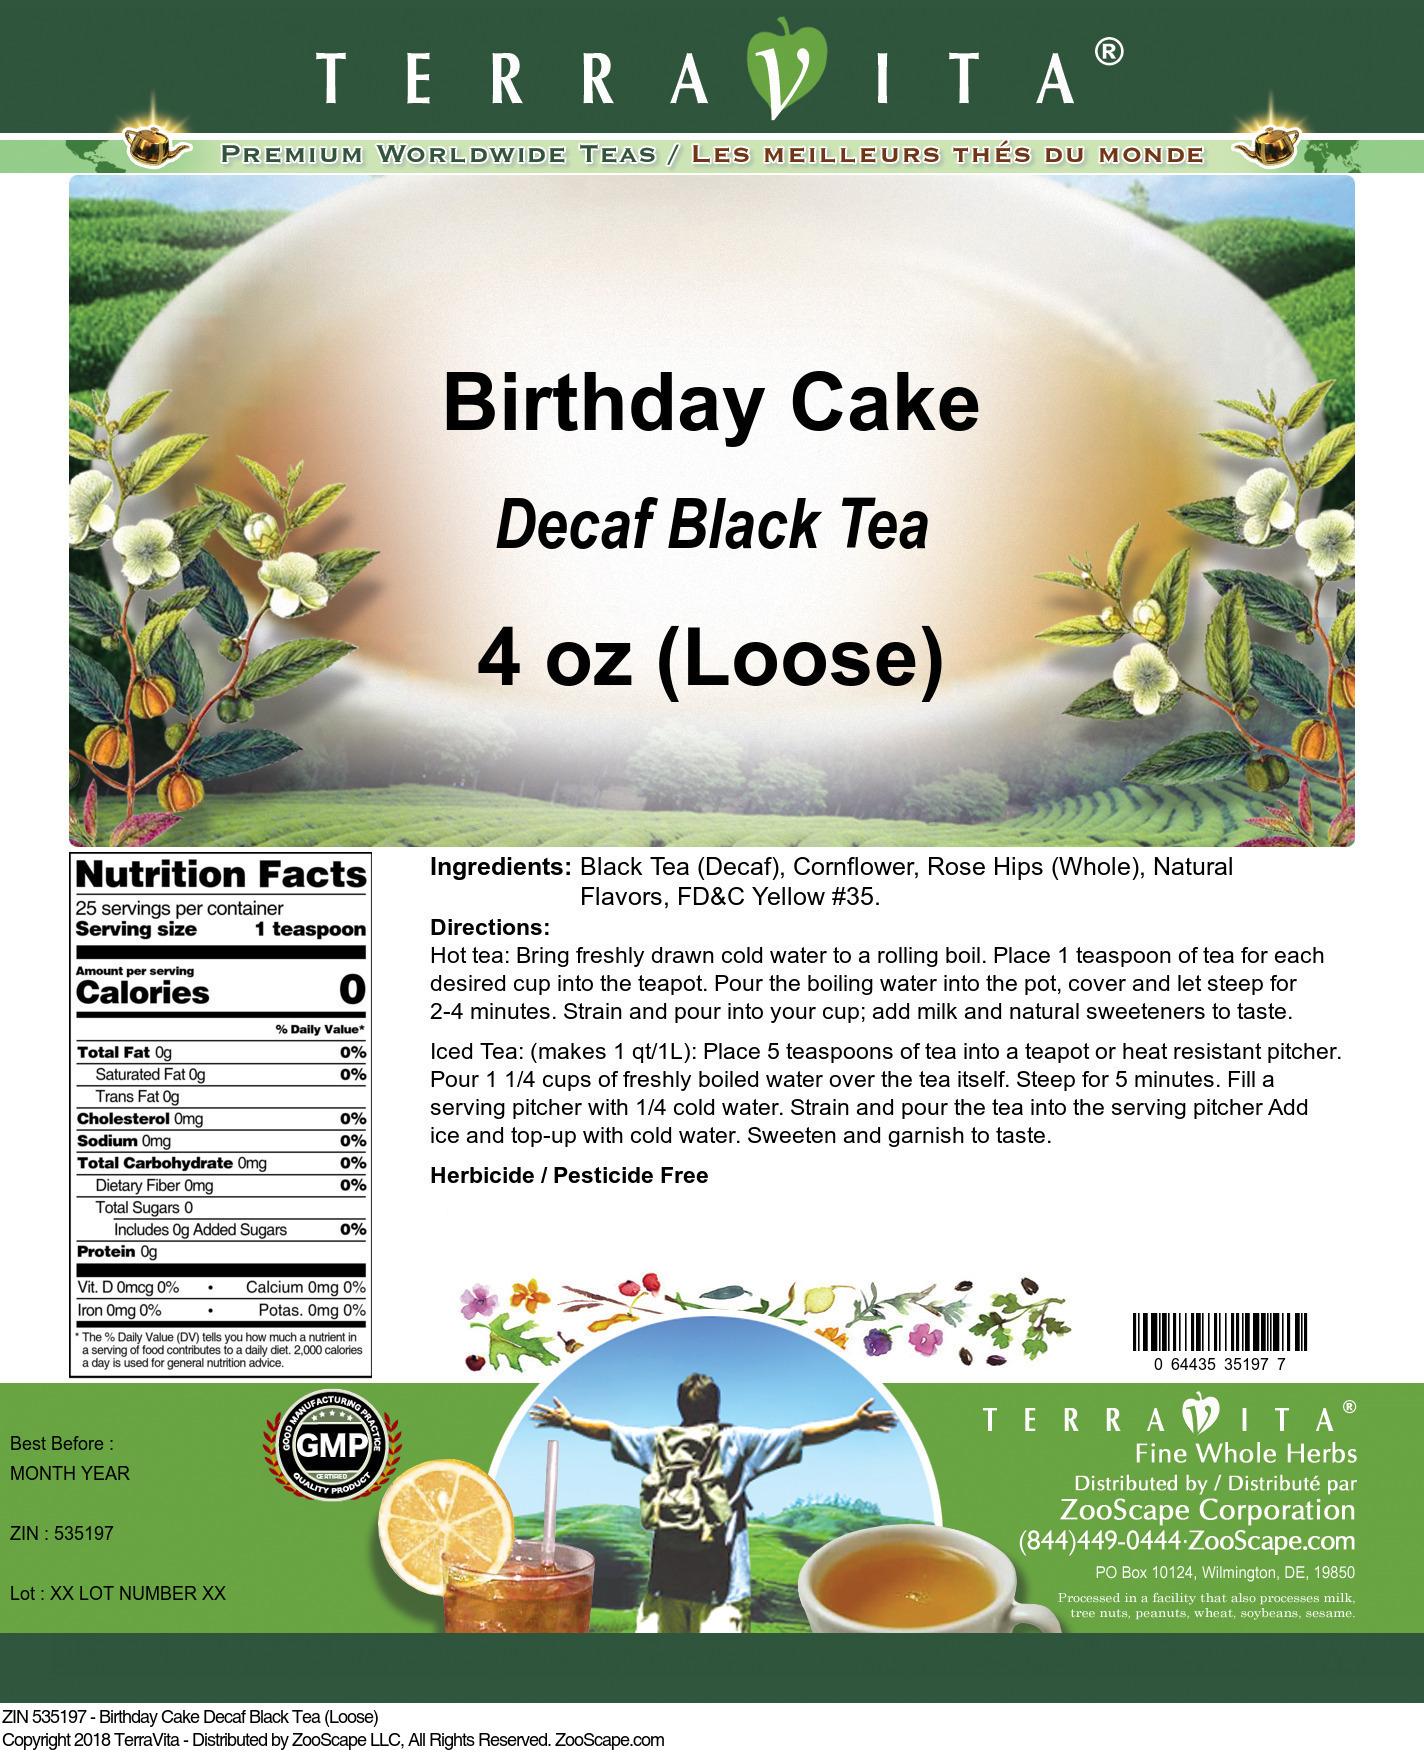 Birthday Cake Decaf Black Tea (Loose)